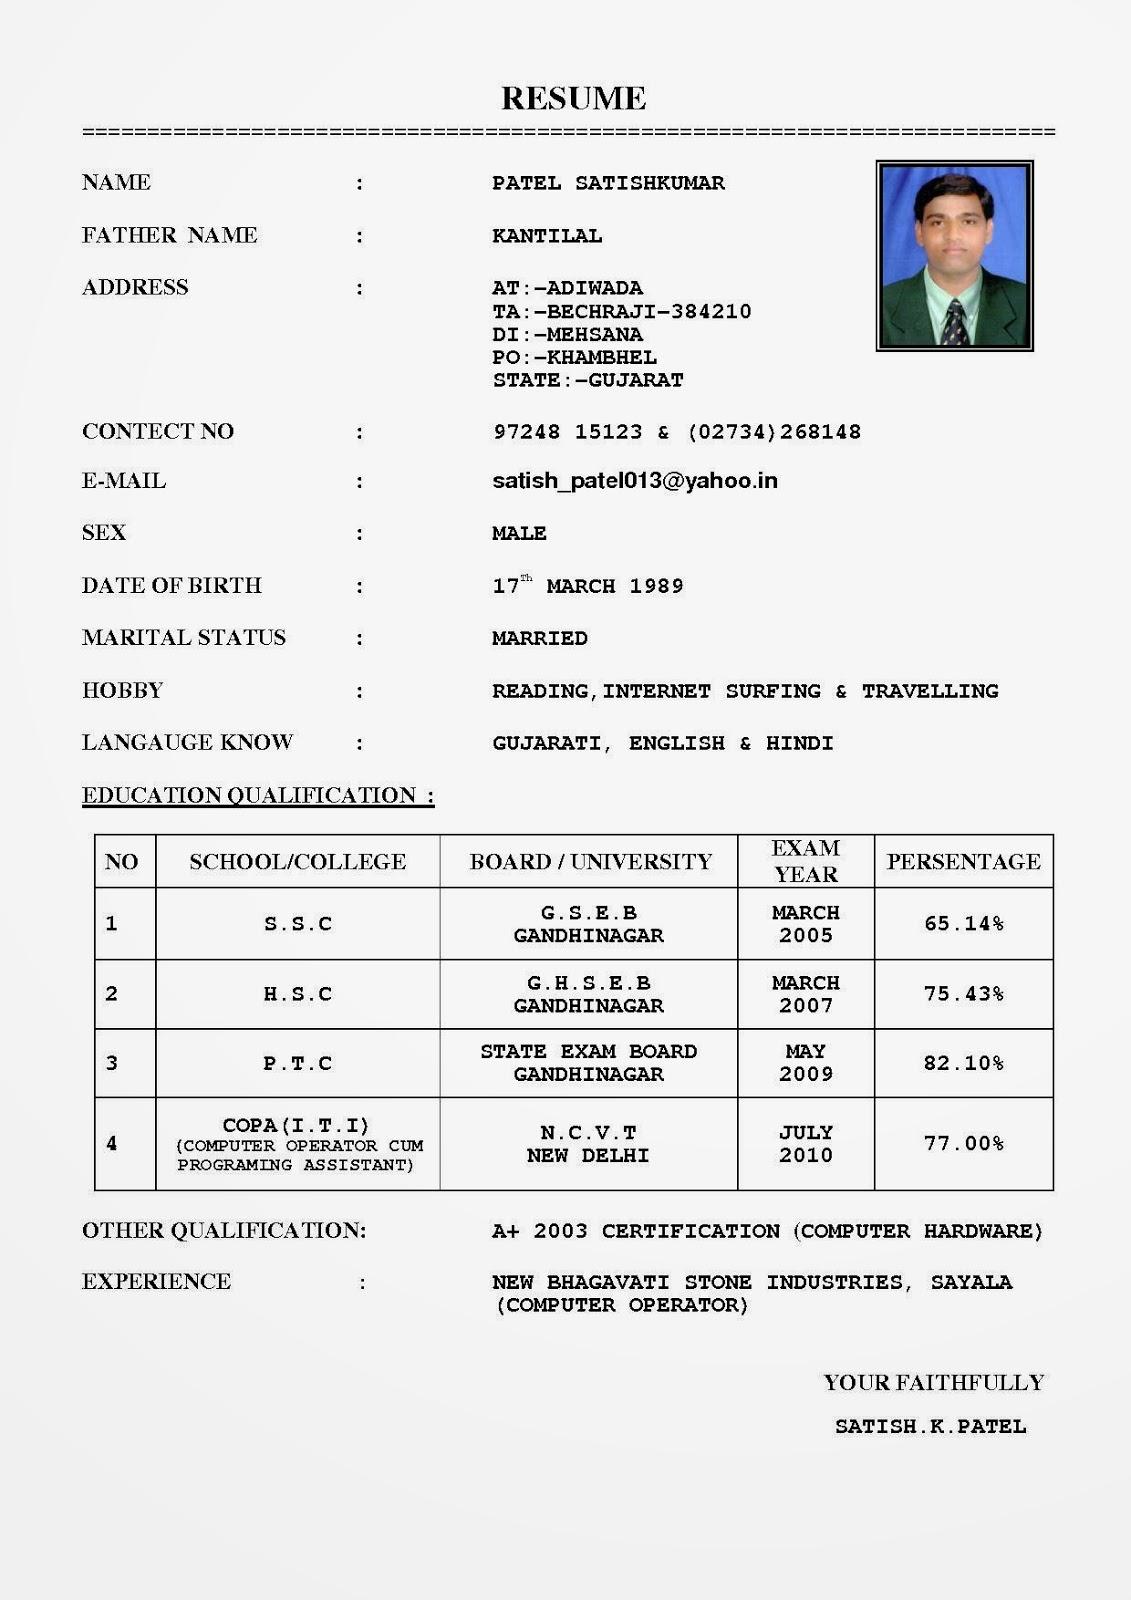 Cara membuat resume mohon kerja - thesistemplate.web.fc2.com